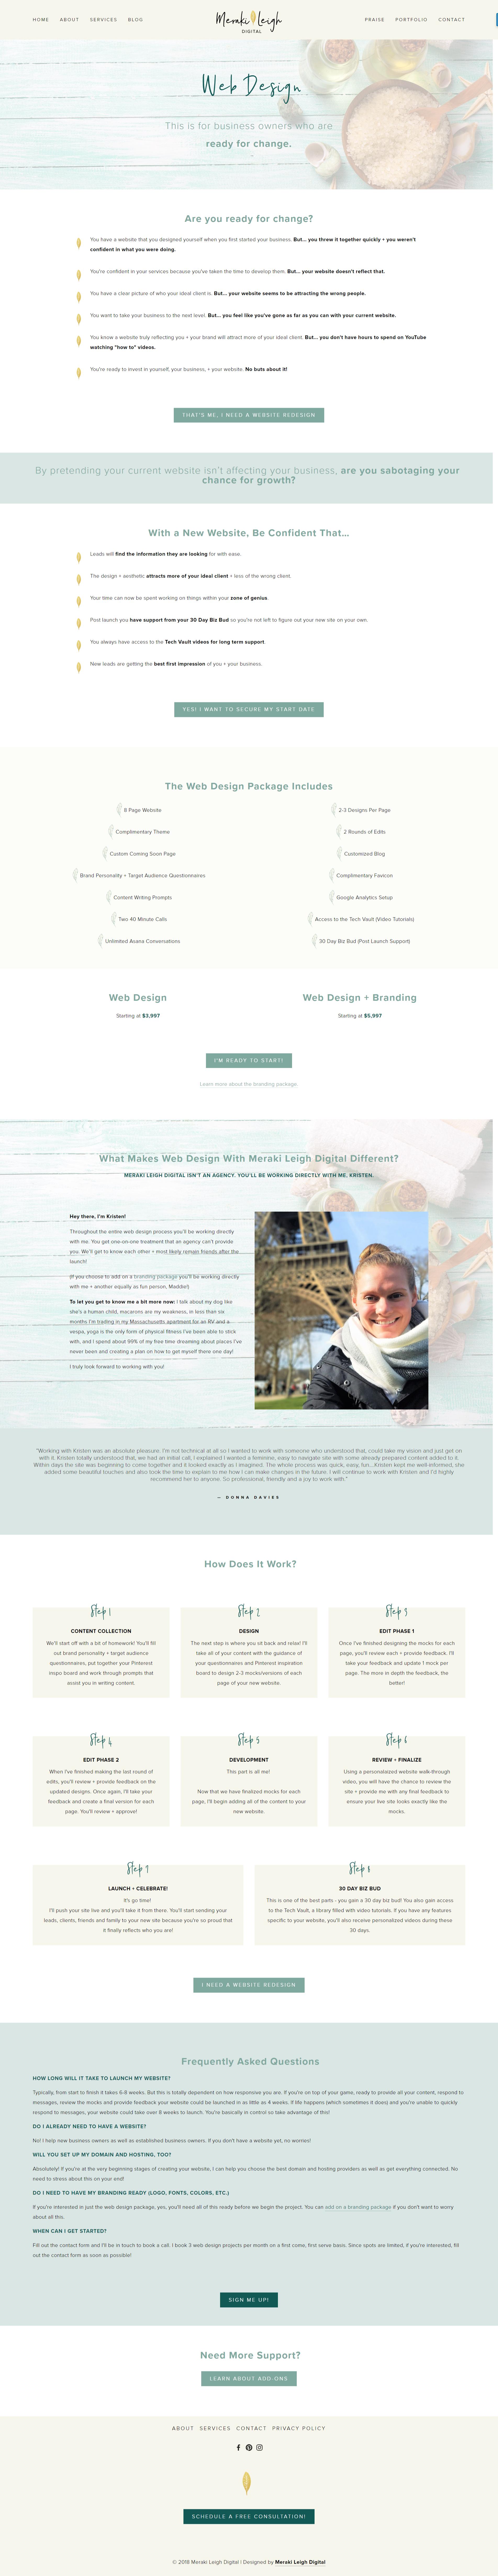 Kristen Leigh | WordPress Web Design Studio | Meraki Leigh Digital Portfolio Piece | Web Design Page